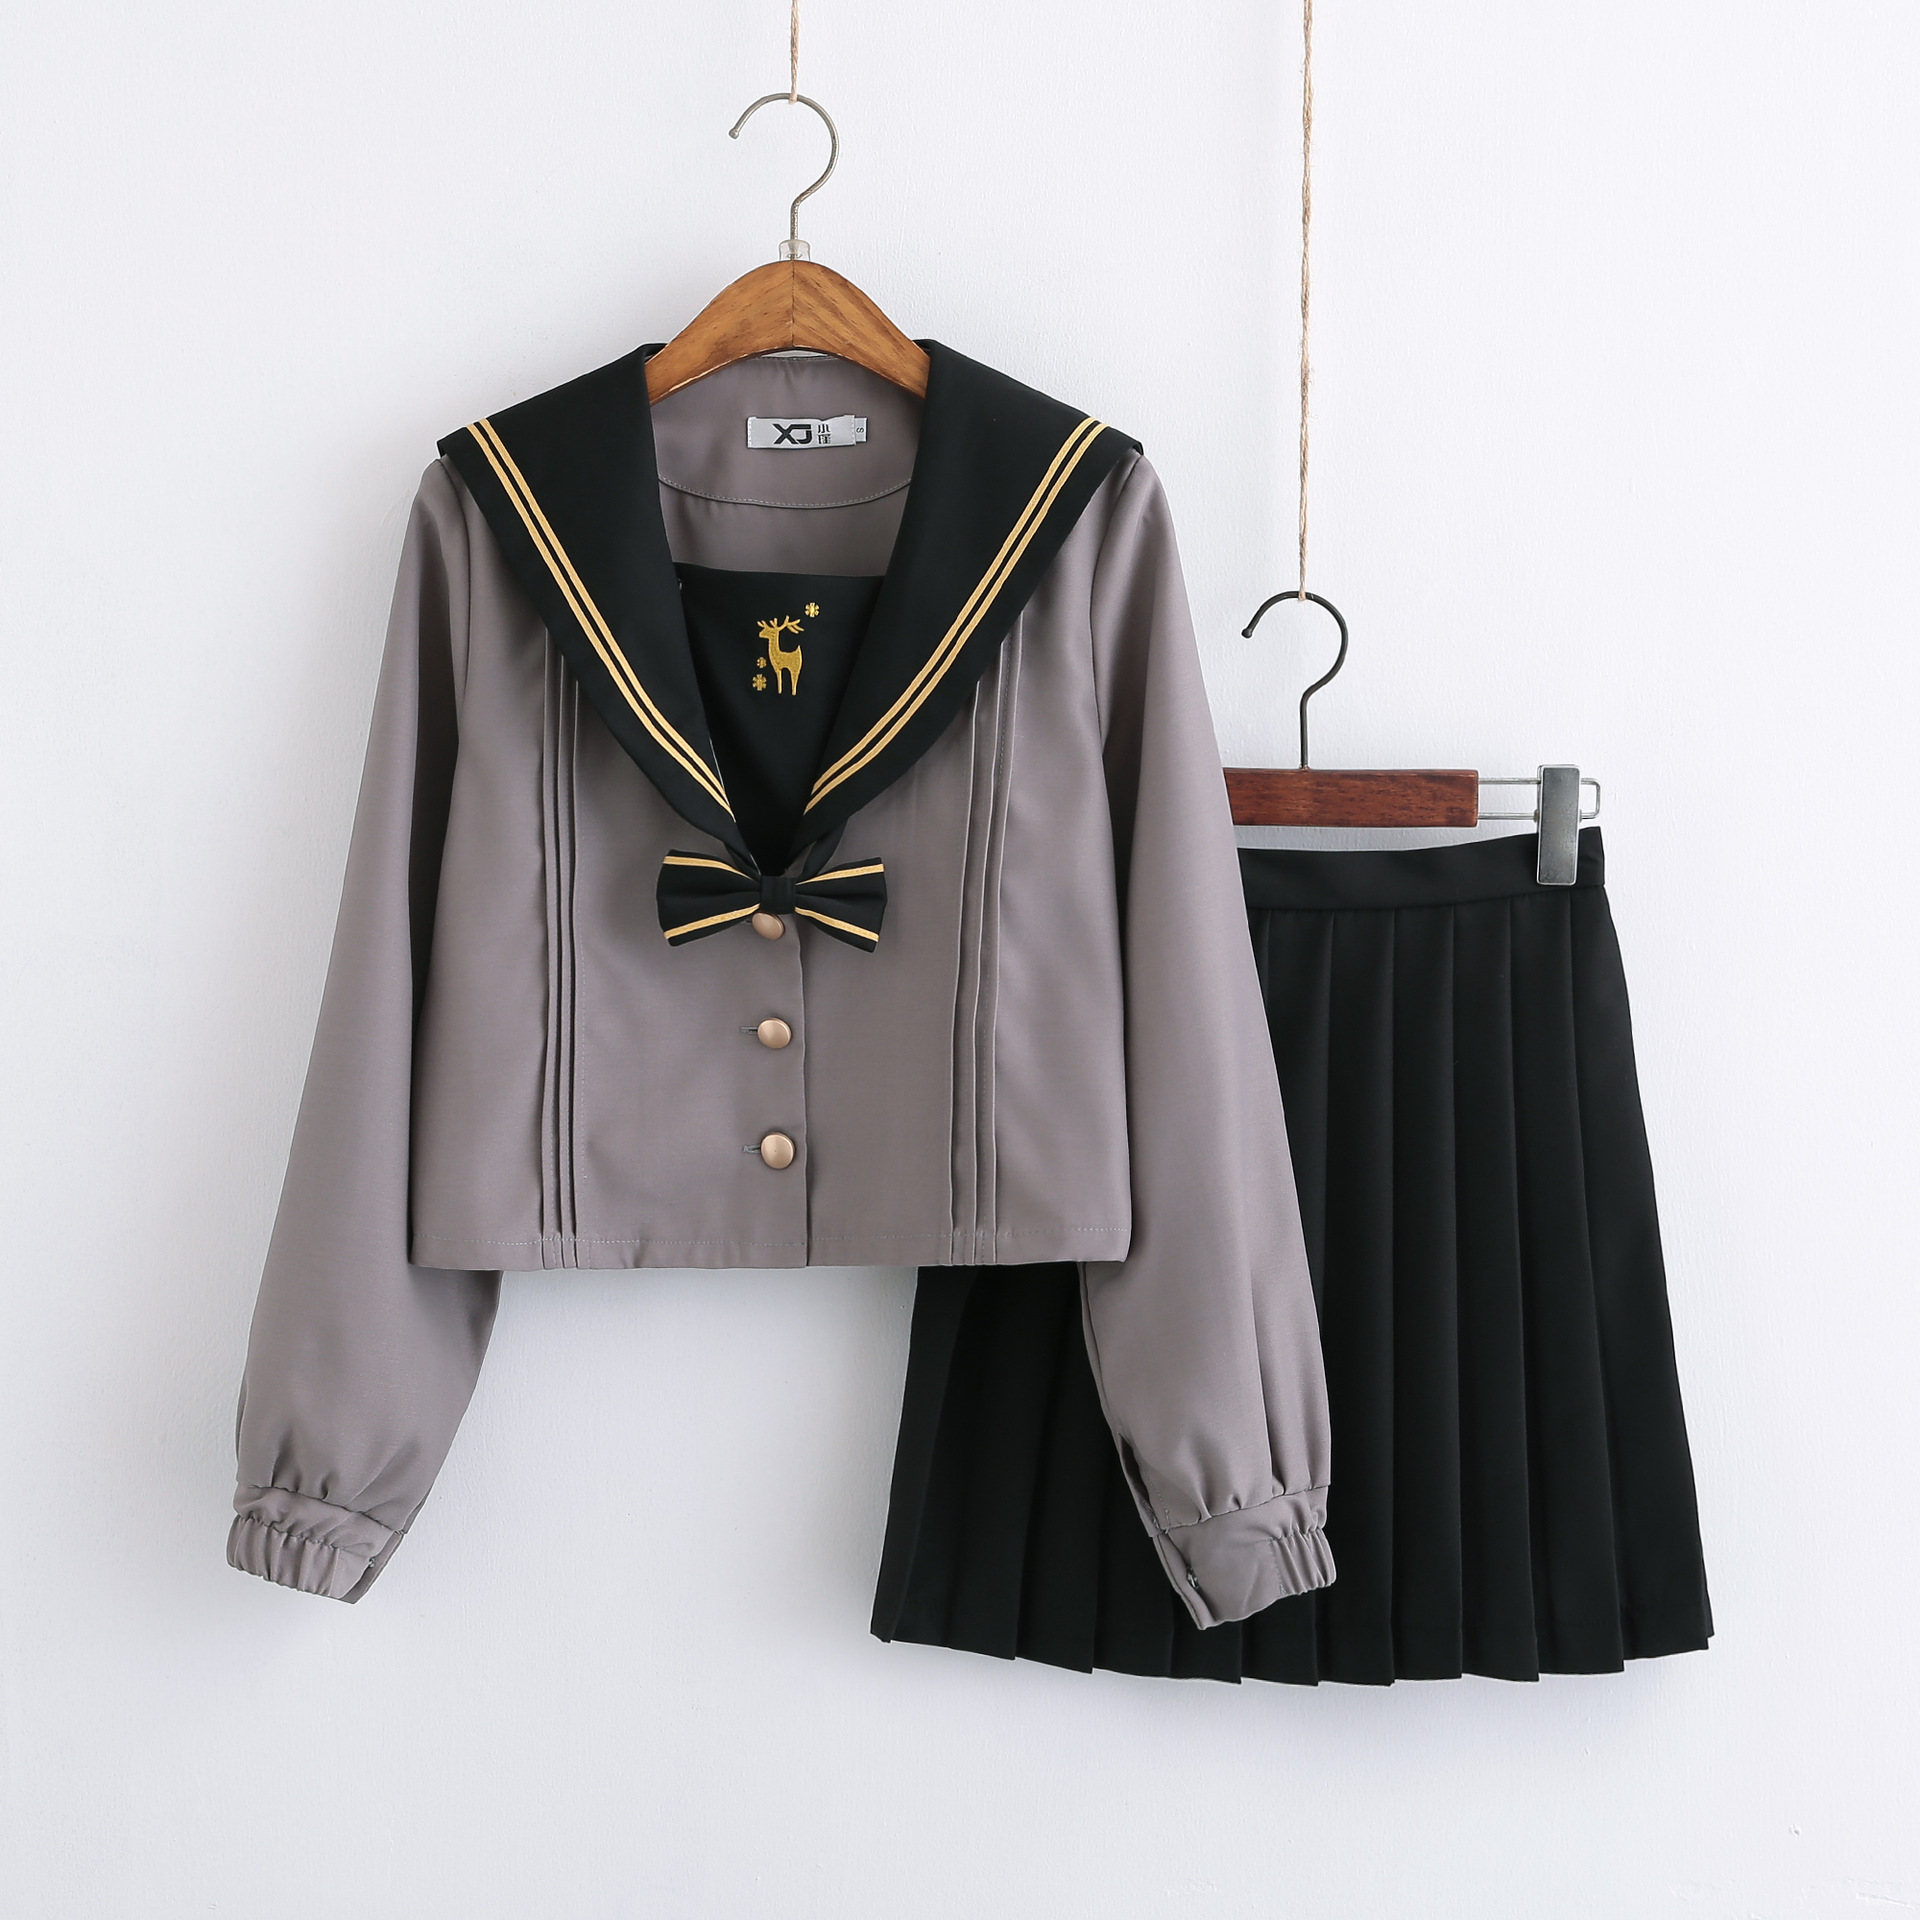 School Uniform Japan Embroidery Academy Style Navy Sailor Suits Saxe Gray Chorus Anime Cosplay Costumes School girl Jk Uniforms